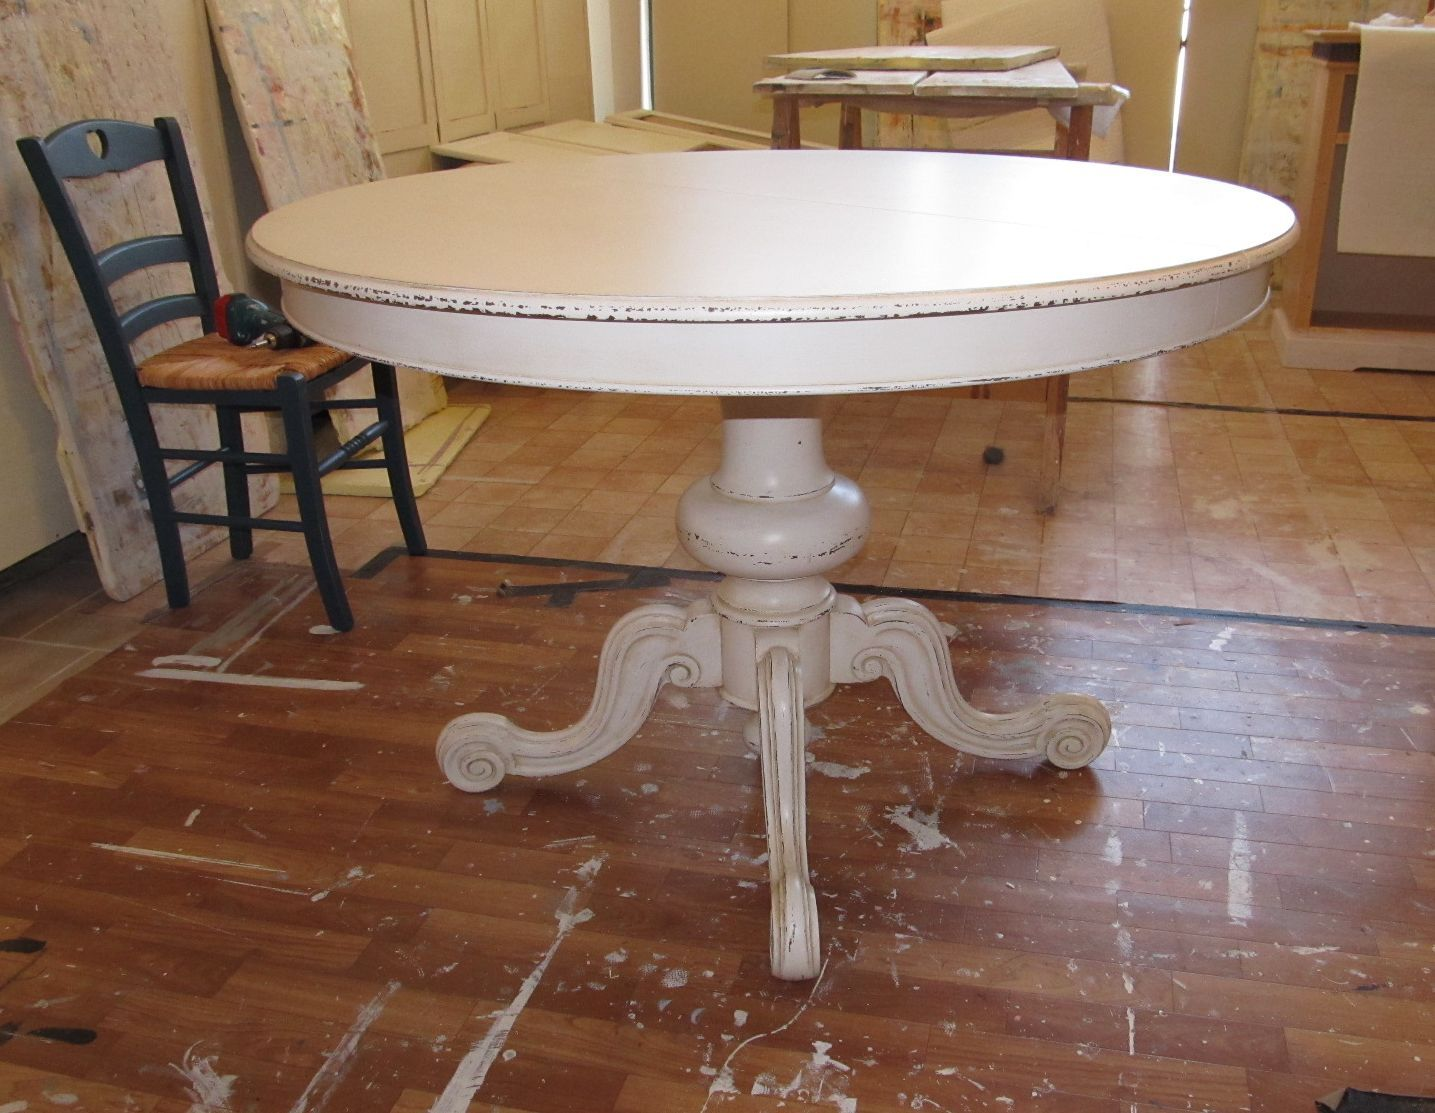 Tavolo Con Gamba Centrale tavolo rotondo #shabby con gamba centrale lavorata (con